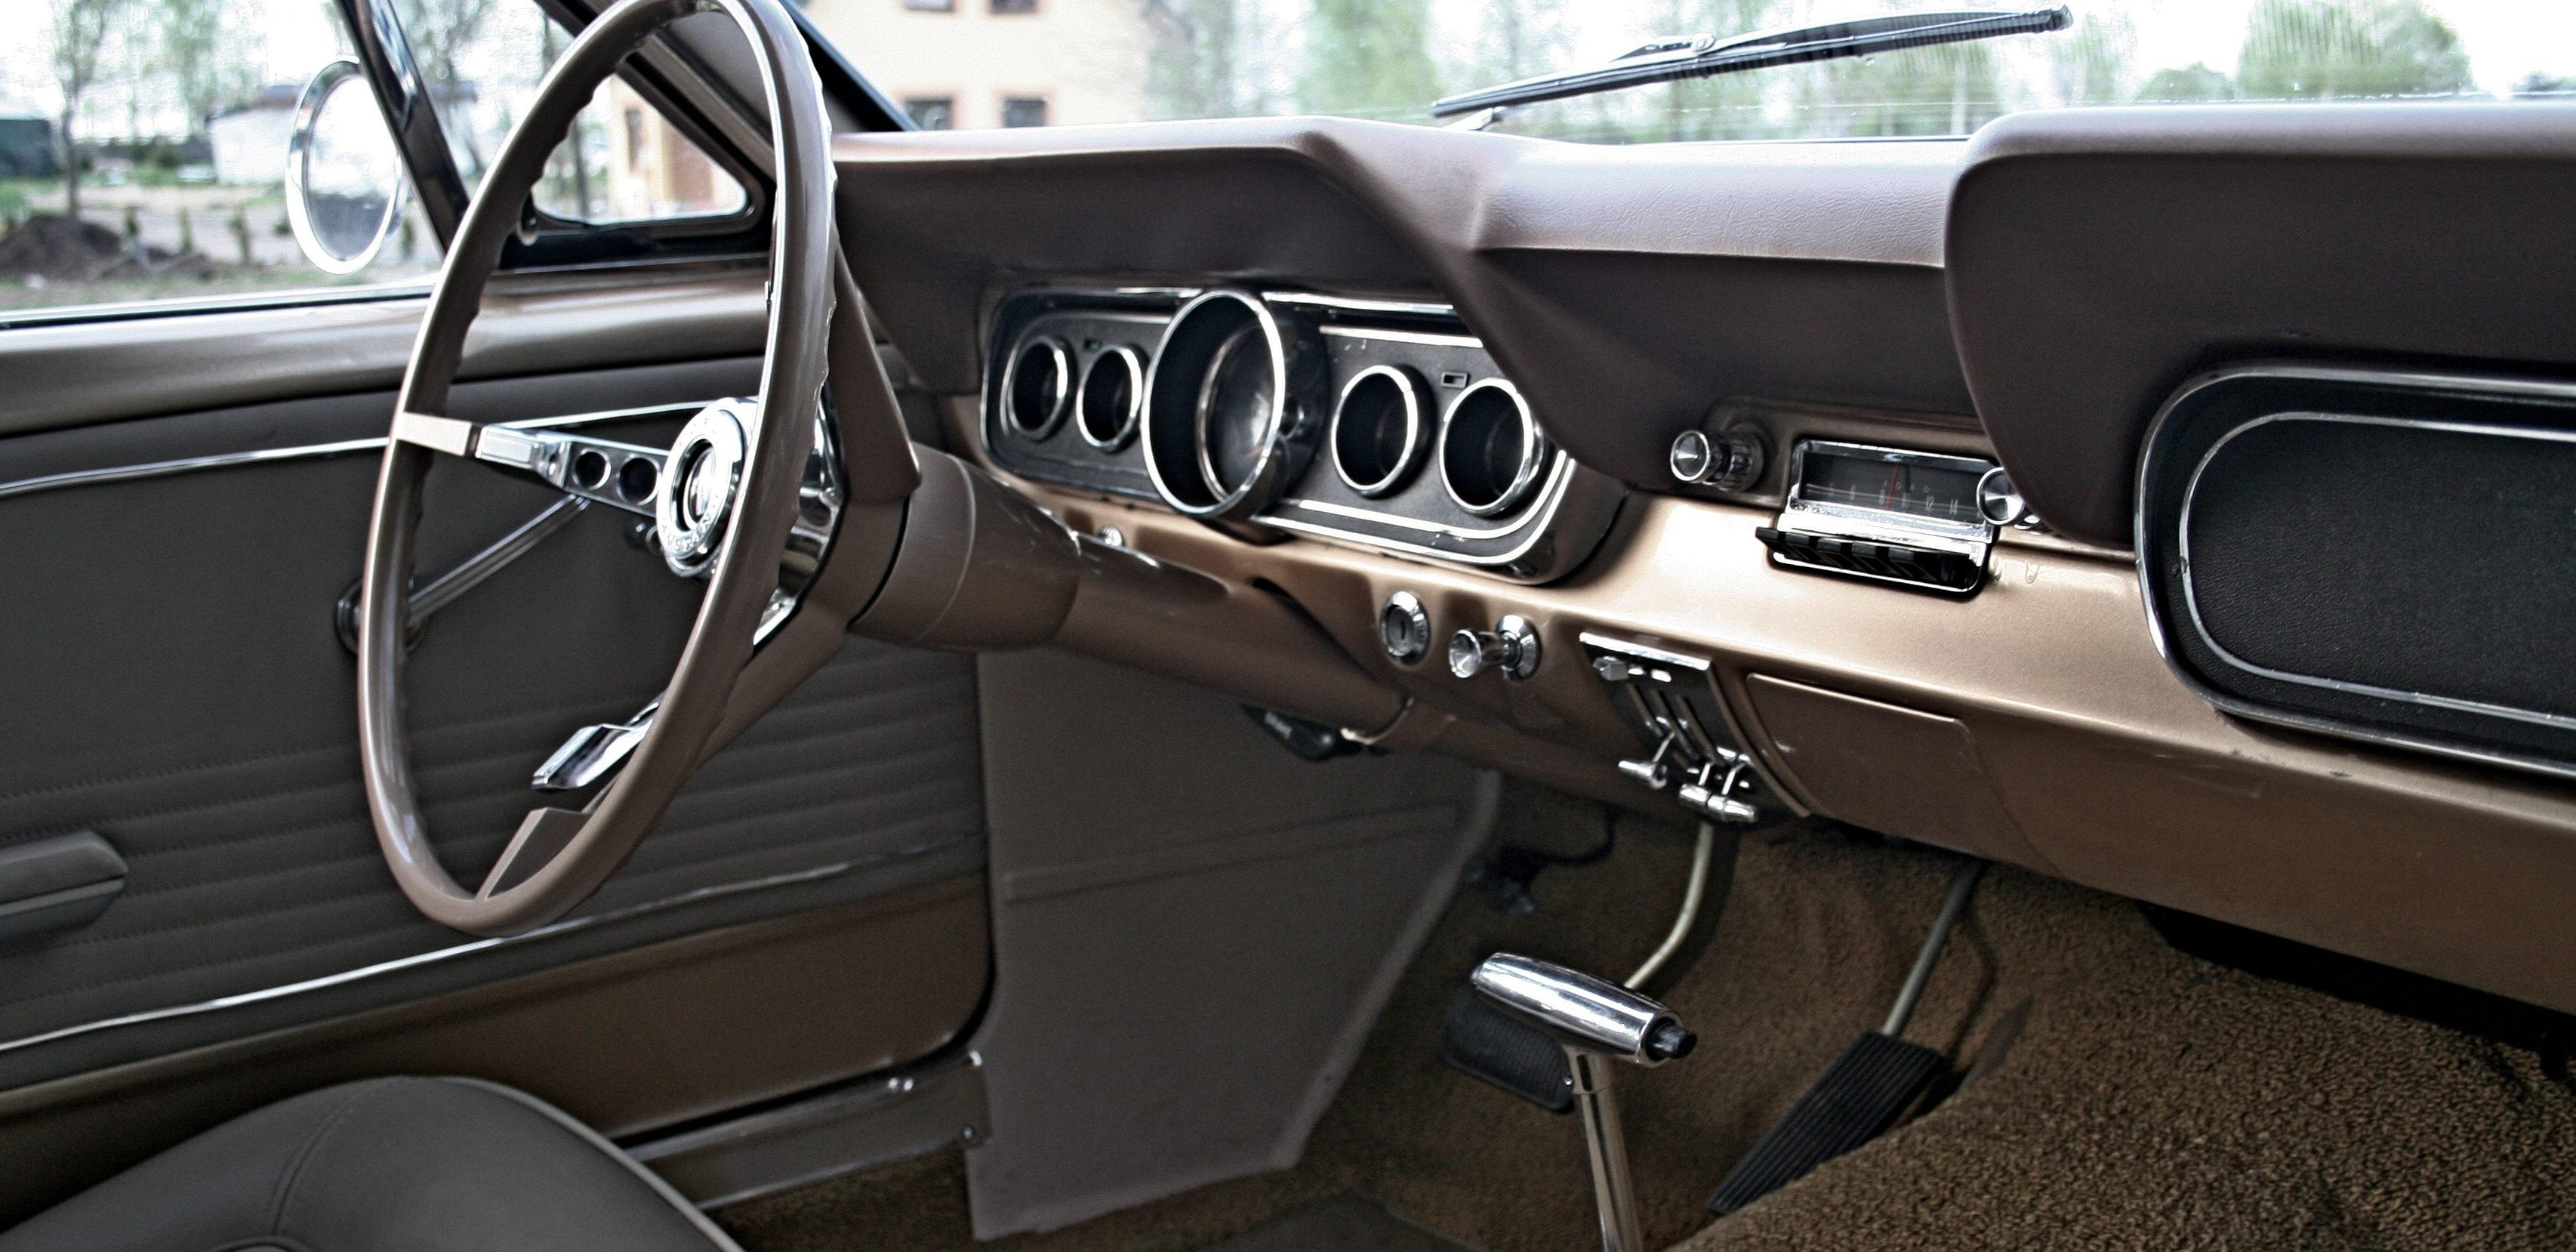 Zapach legendy – Mustang 289